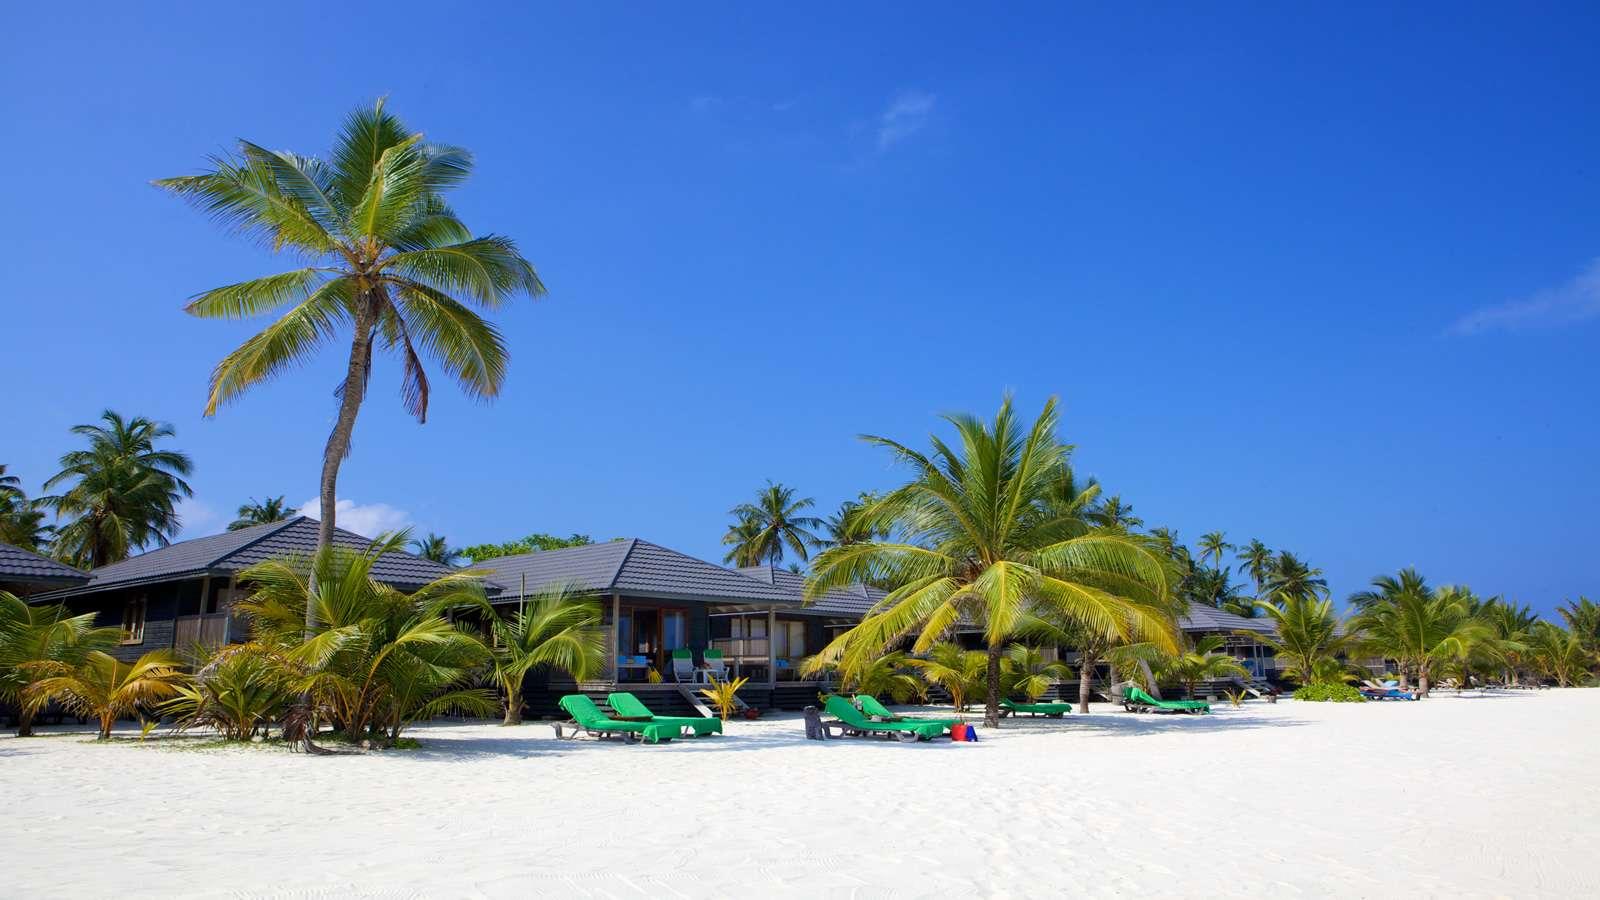 Kuredu Island Resort, Lhaviyani Atoll, The Maldives